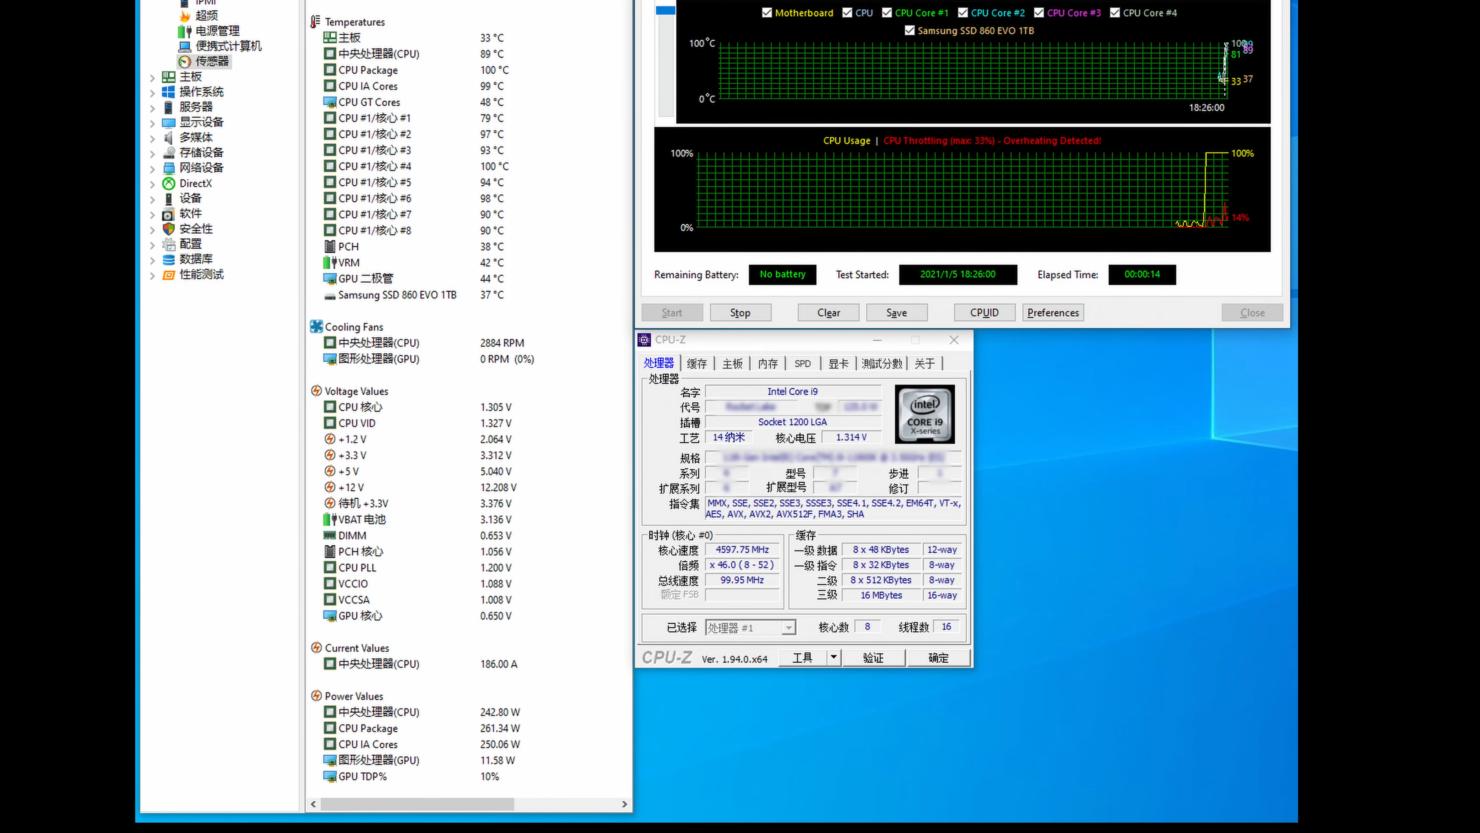 intel-core-i9-11900k-11th-gen-rocket-lake-desktop-cpu-benchmark-leak-_7